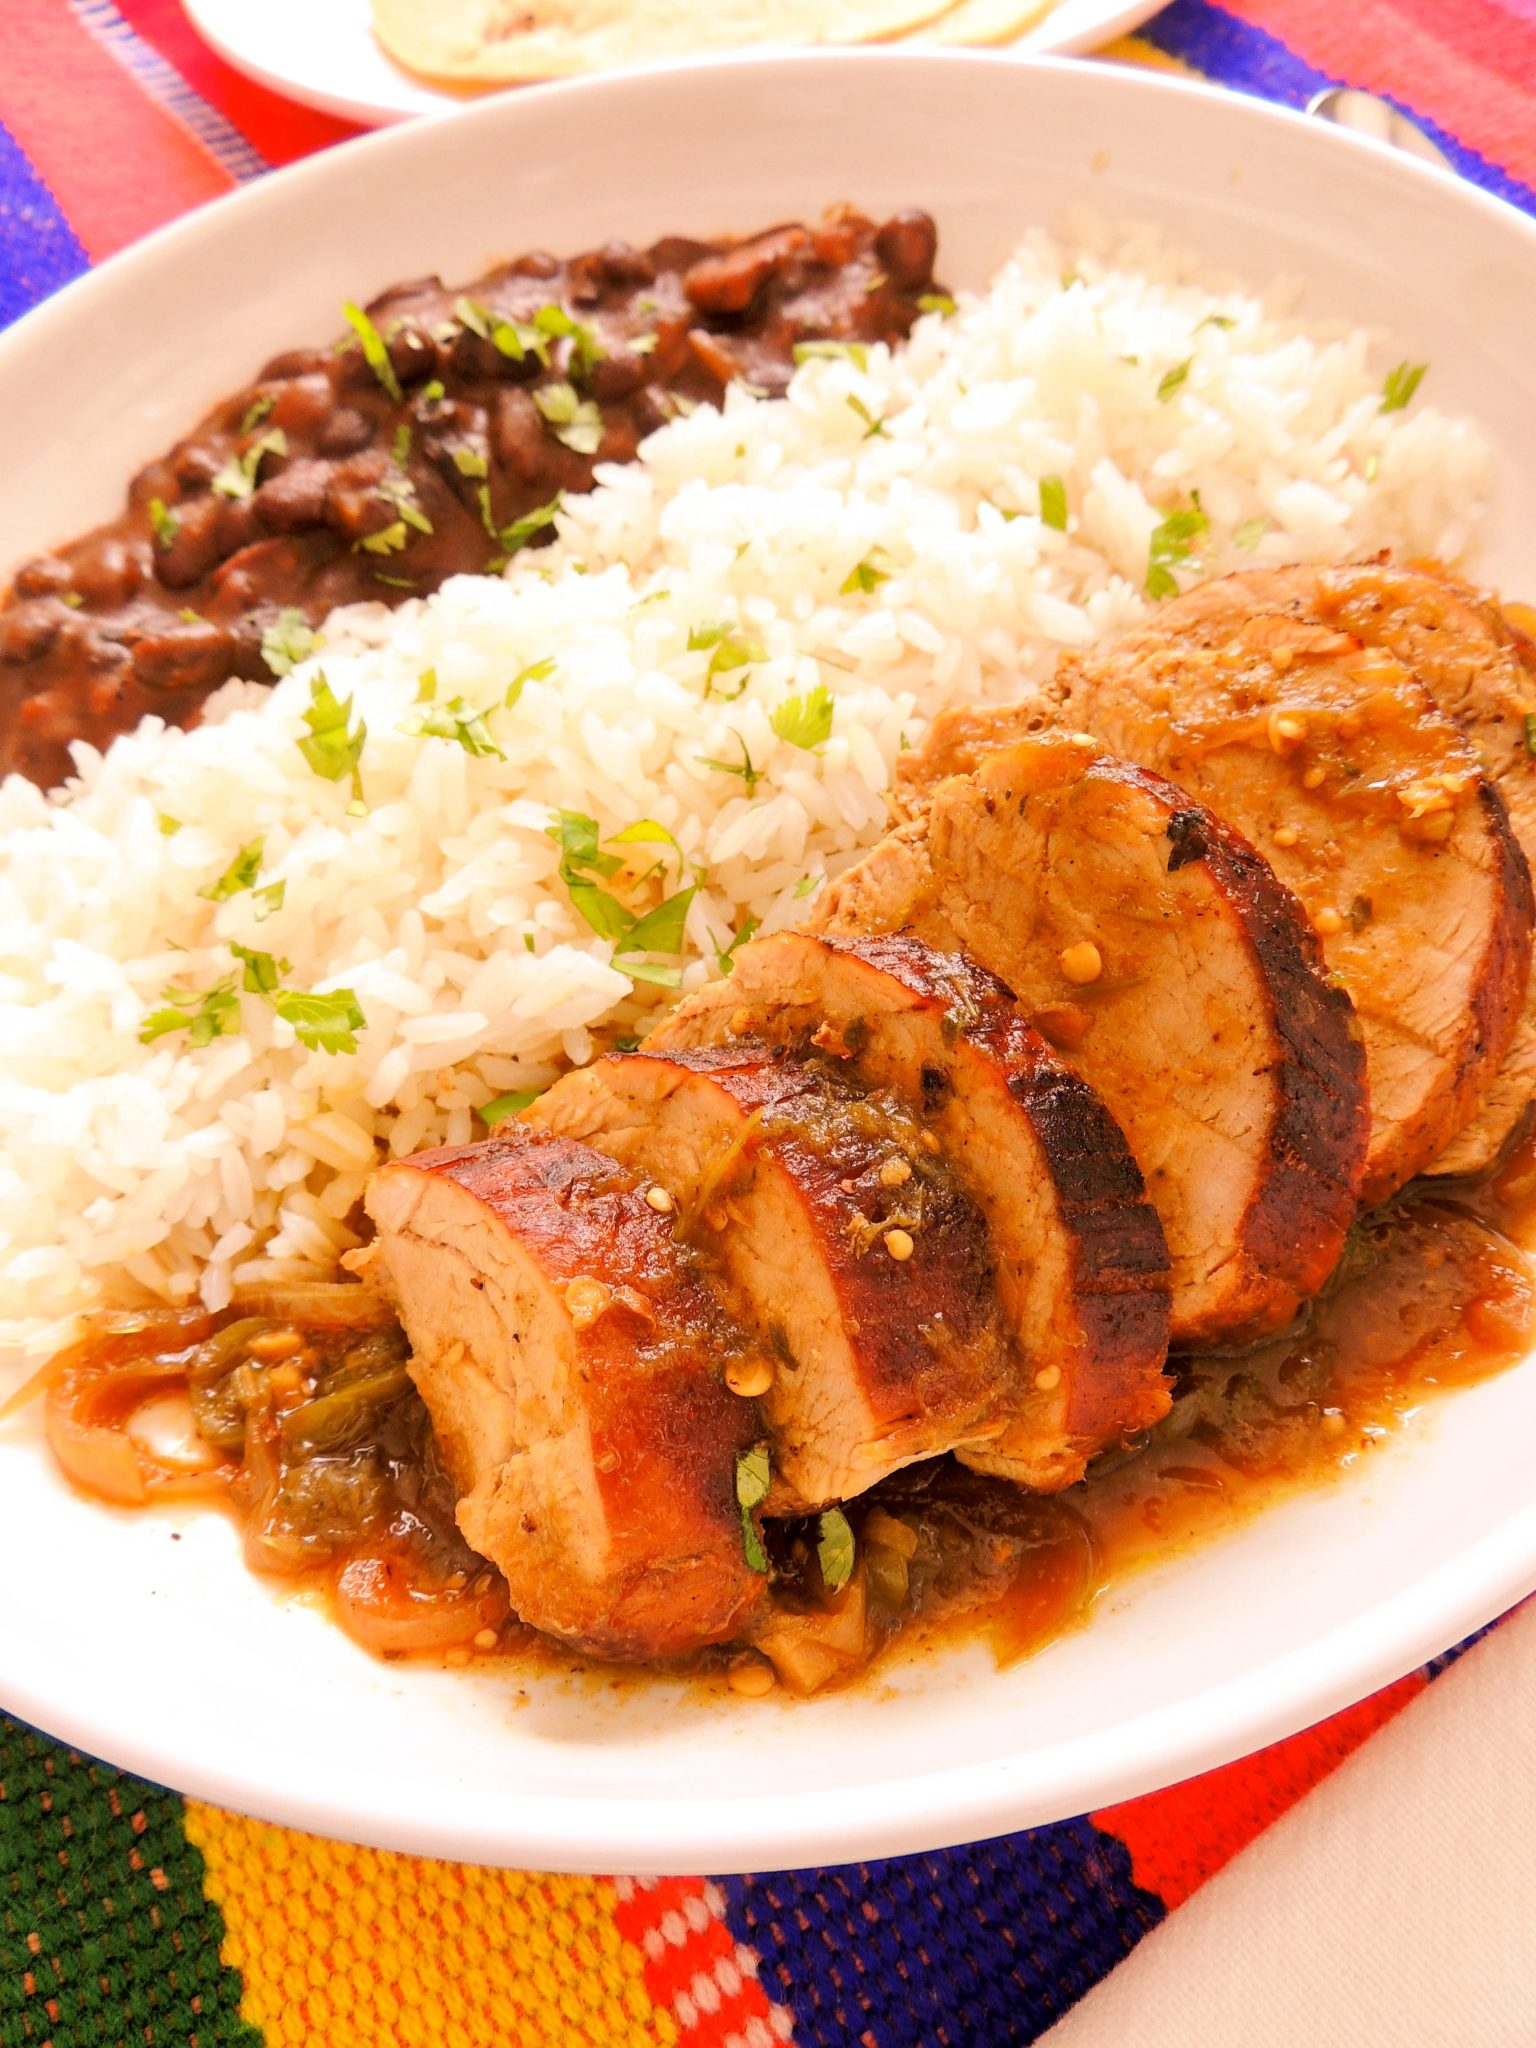 Salsa verde pork tenderloin - The Petit Gourmet